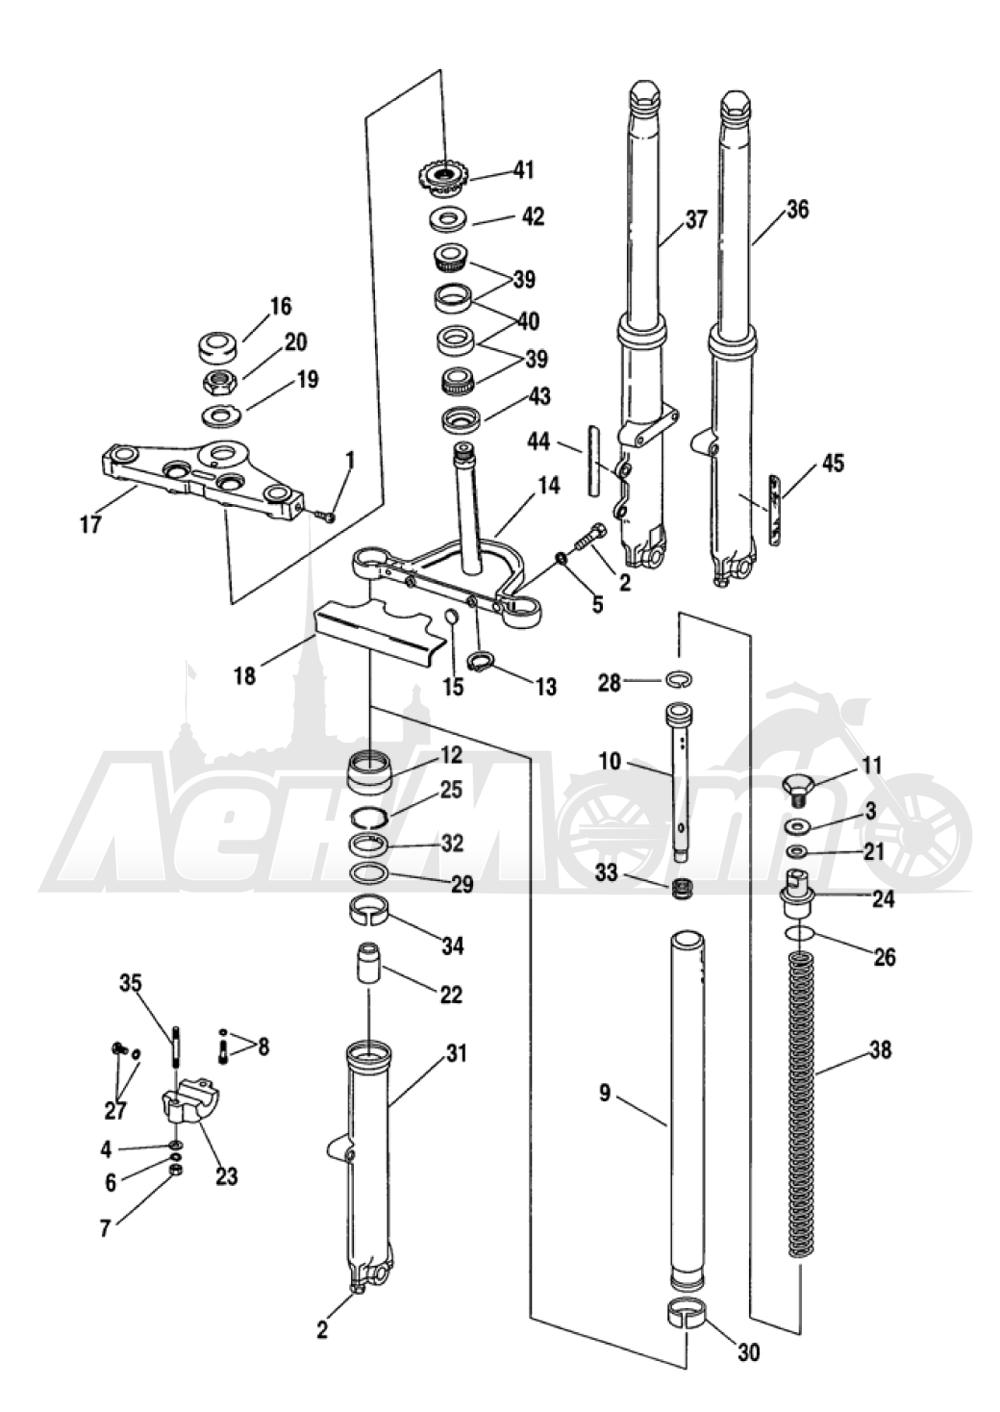 Запчасти для Мотоцикла Harley-Davidson 2005 FXDWG DYNA® WIDE GLIDE (GE) Раздел: SUSPENSION - FRONT FORK ASSEMBLY W/ STEERING STEM | передняя подвеска вилка в сборе вместе с рулевое управление стойка